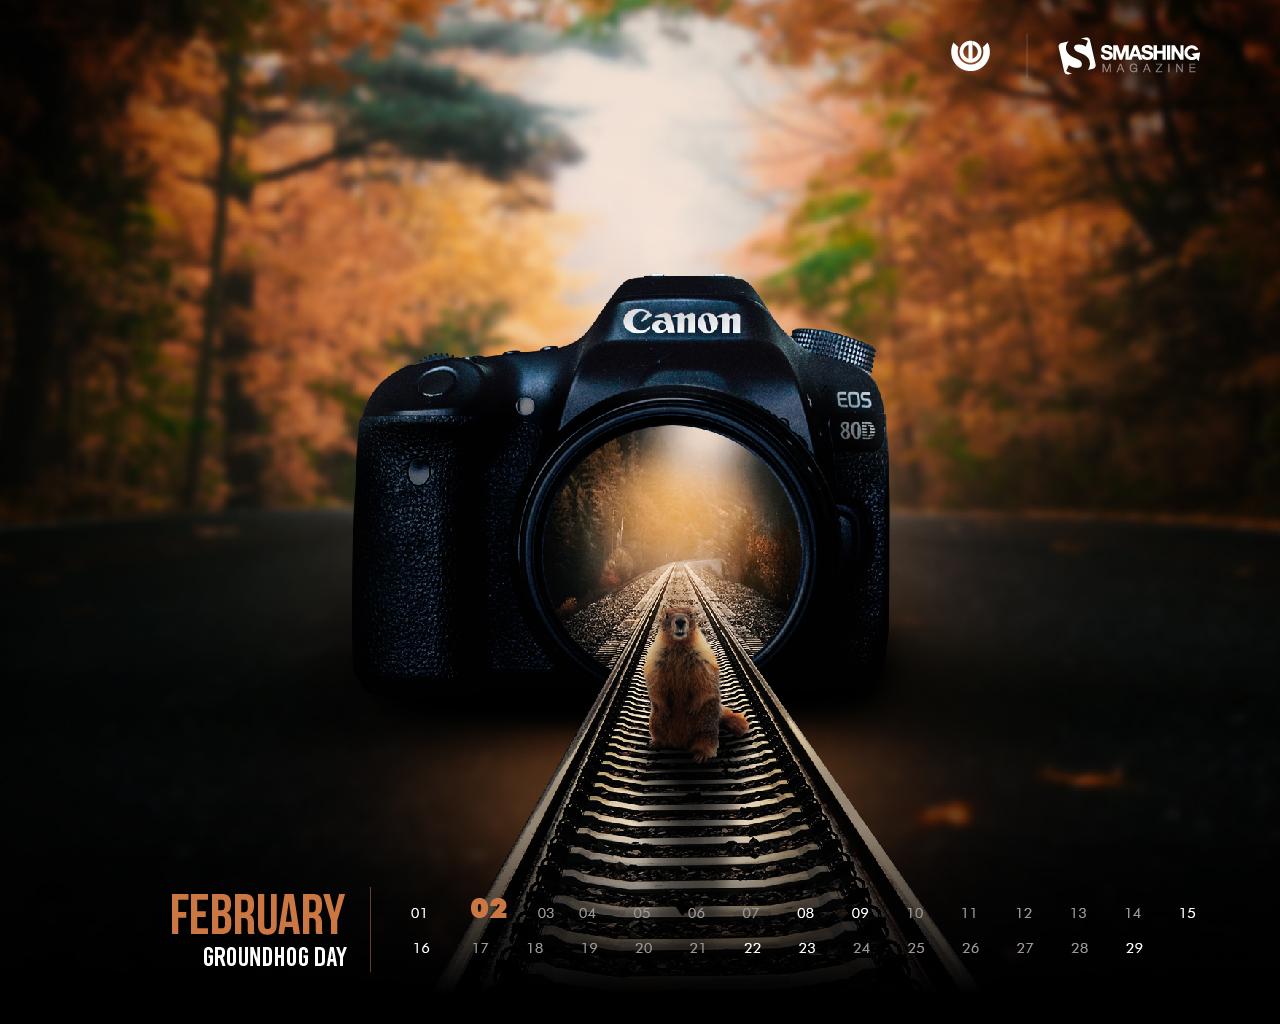 29 Days Of February 2020 Wallpapers Edition Smashing Magazine 1280x1024